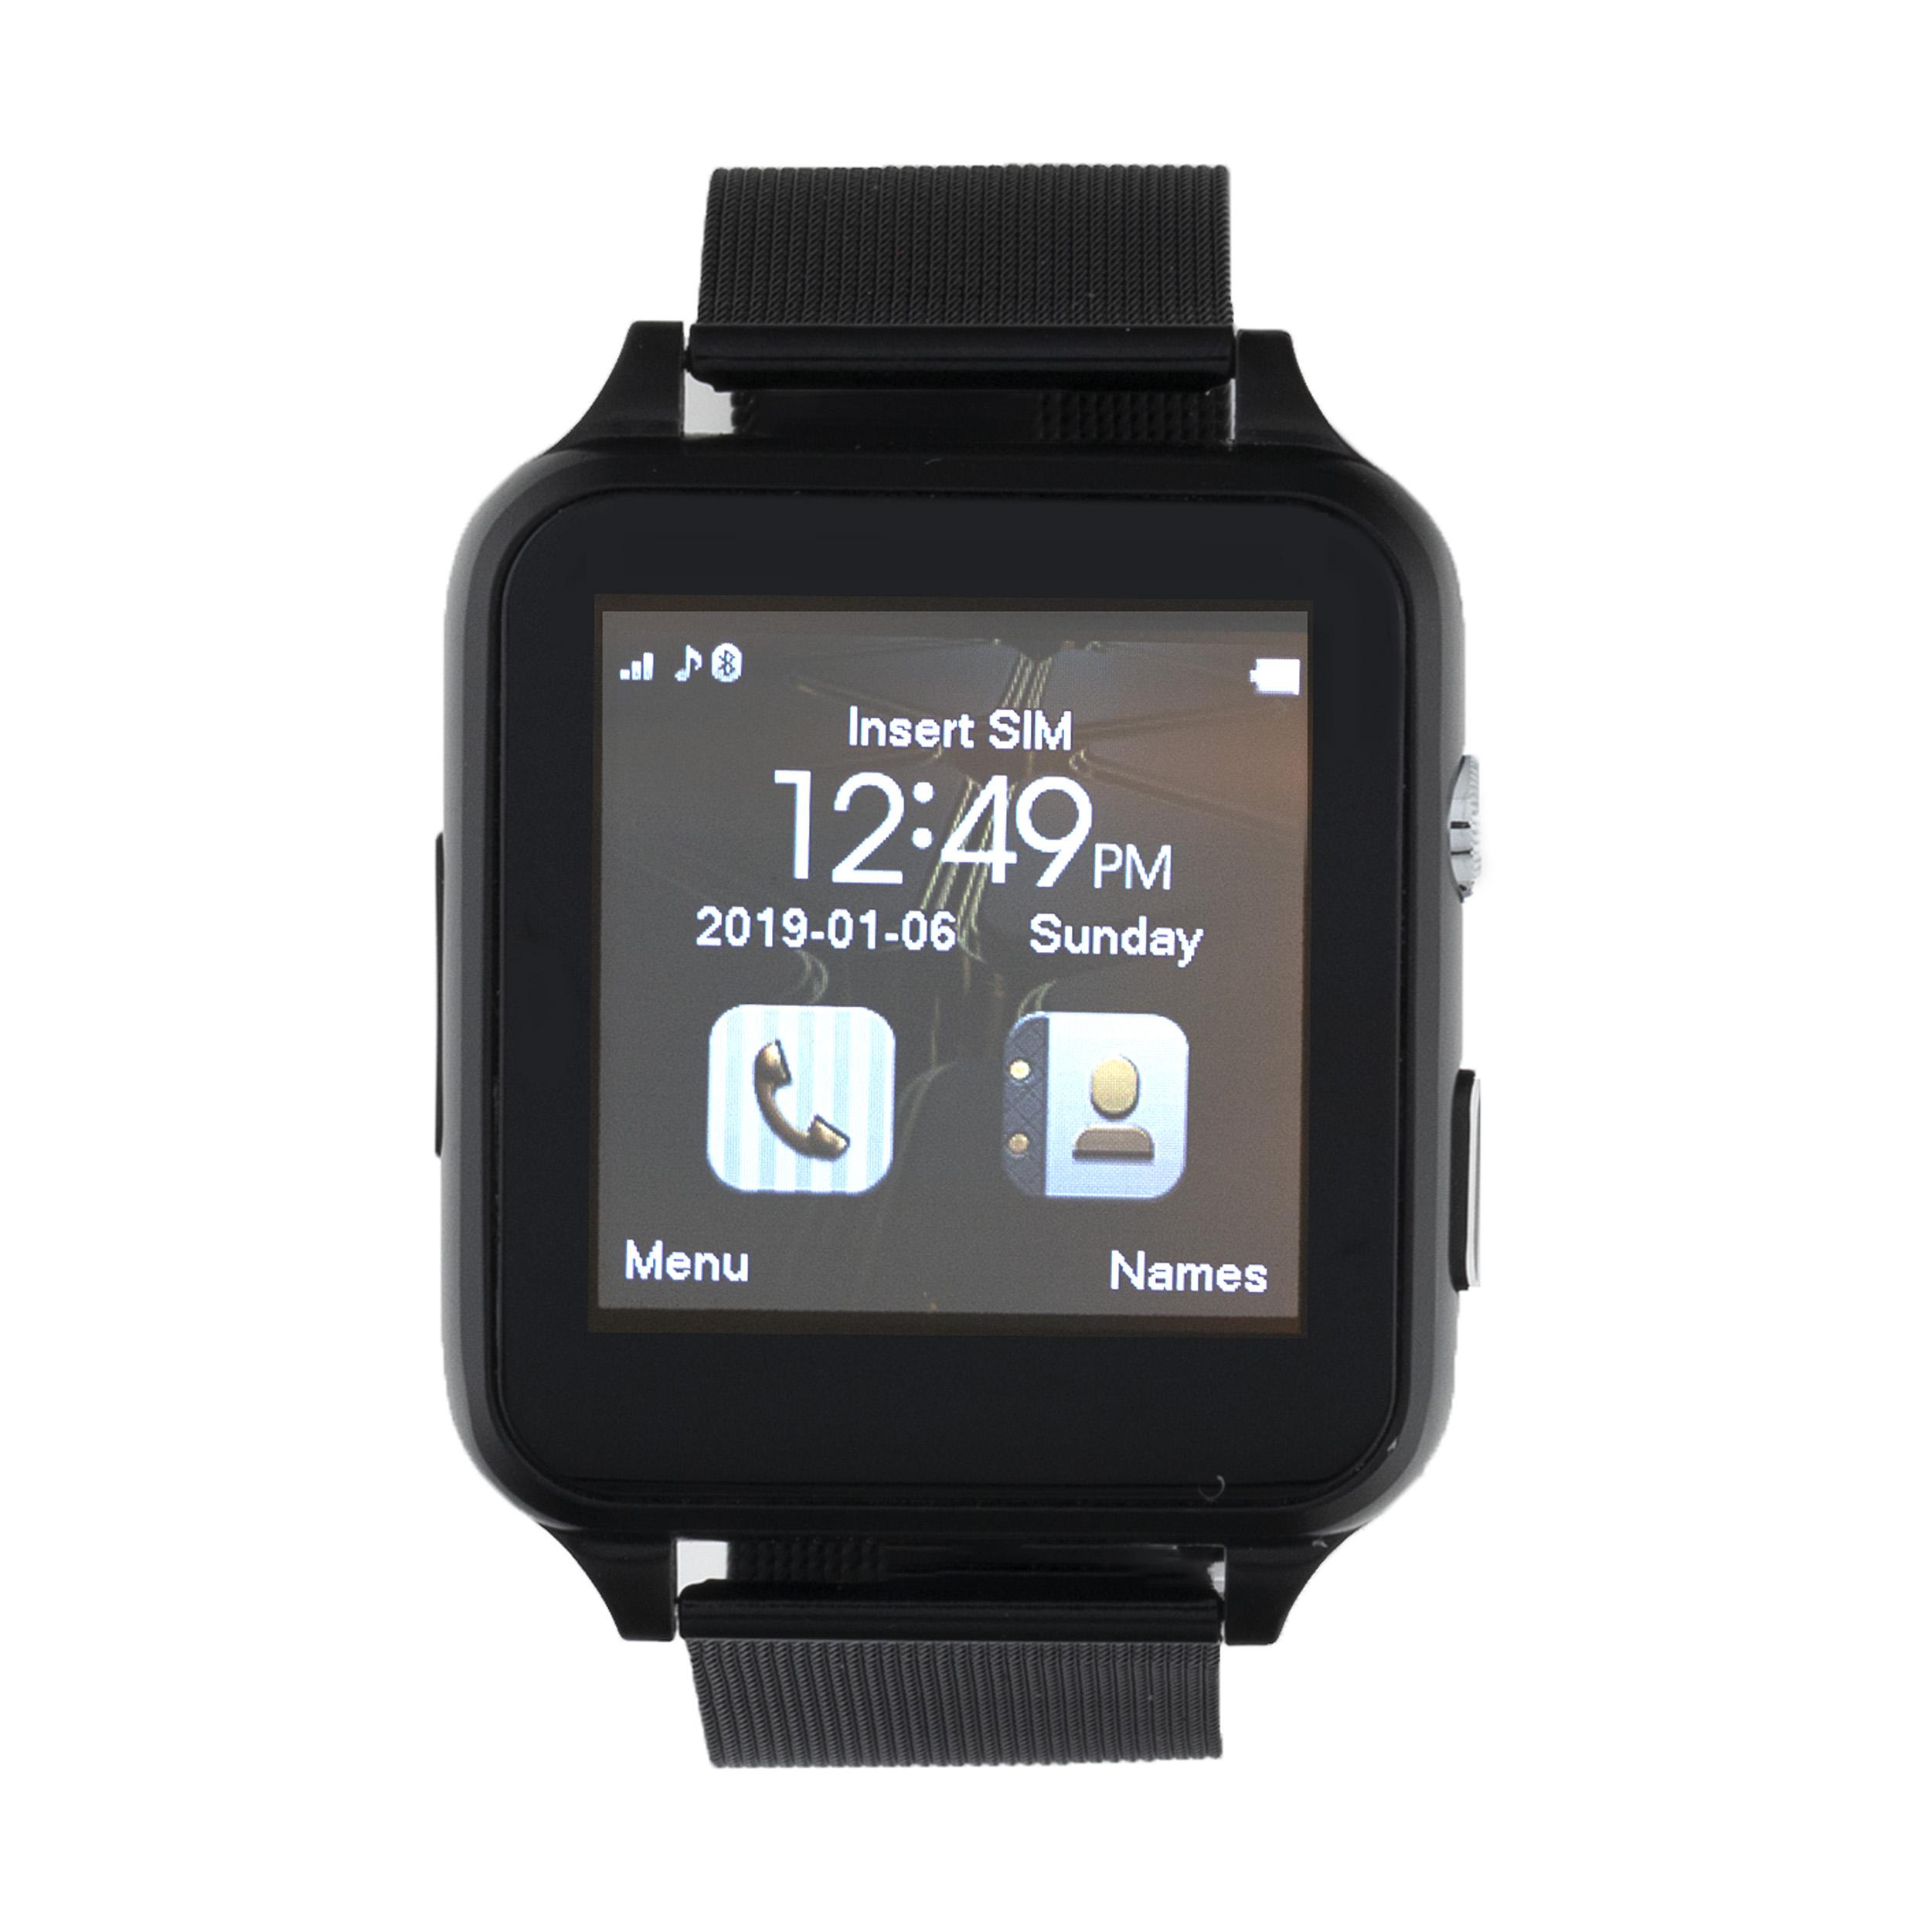 ساعت هوشمند واچ فون اسمارت واچ مدل X8